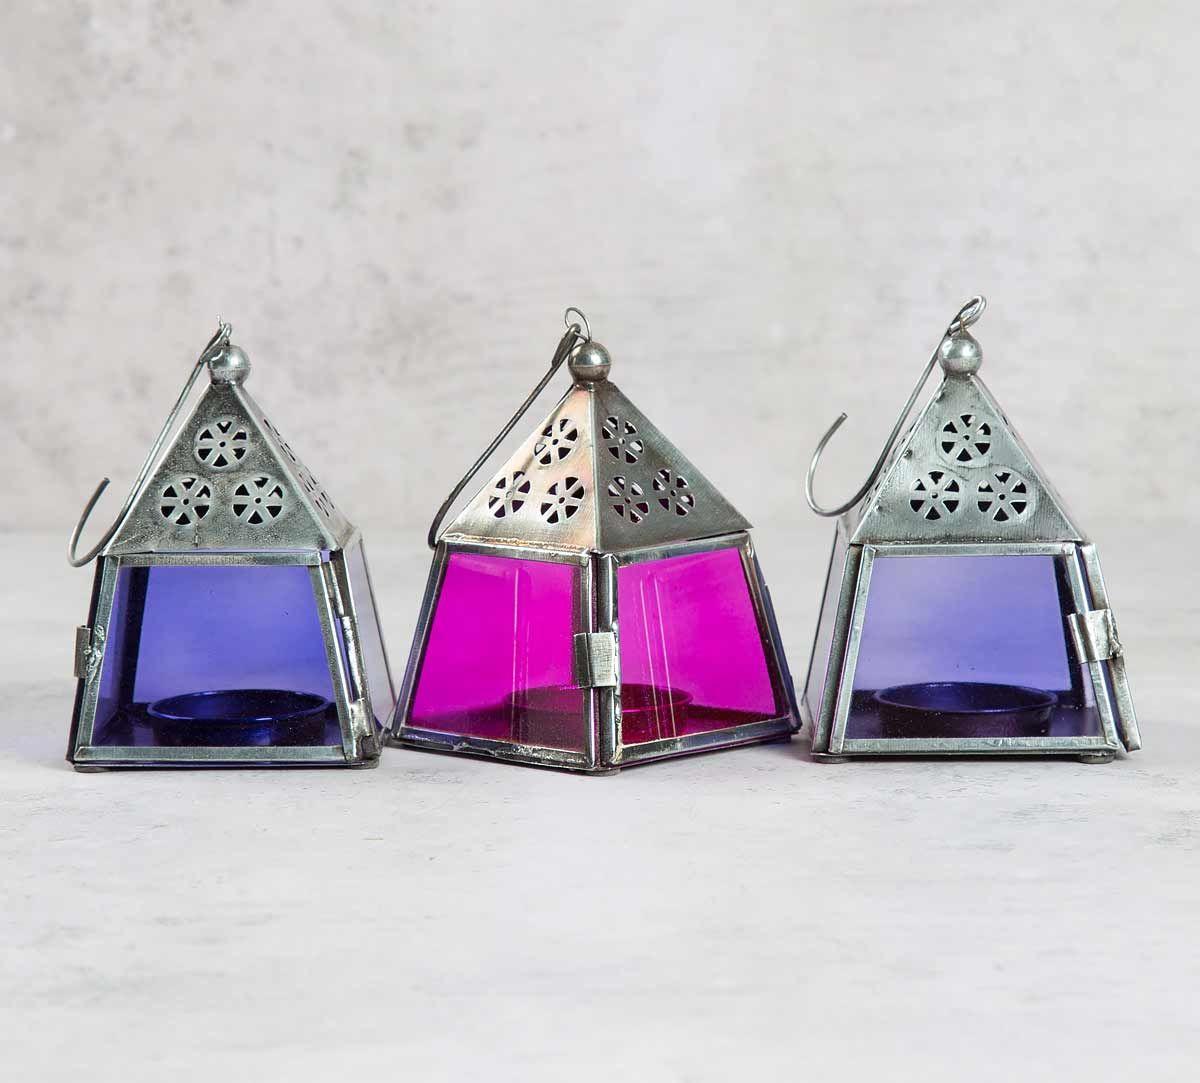 Pyramid Candle Lanterns